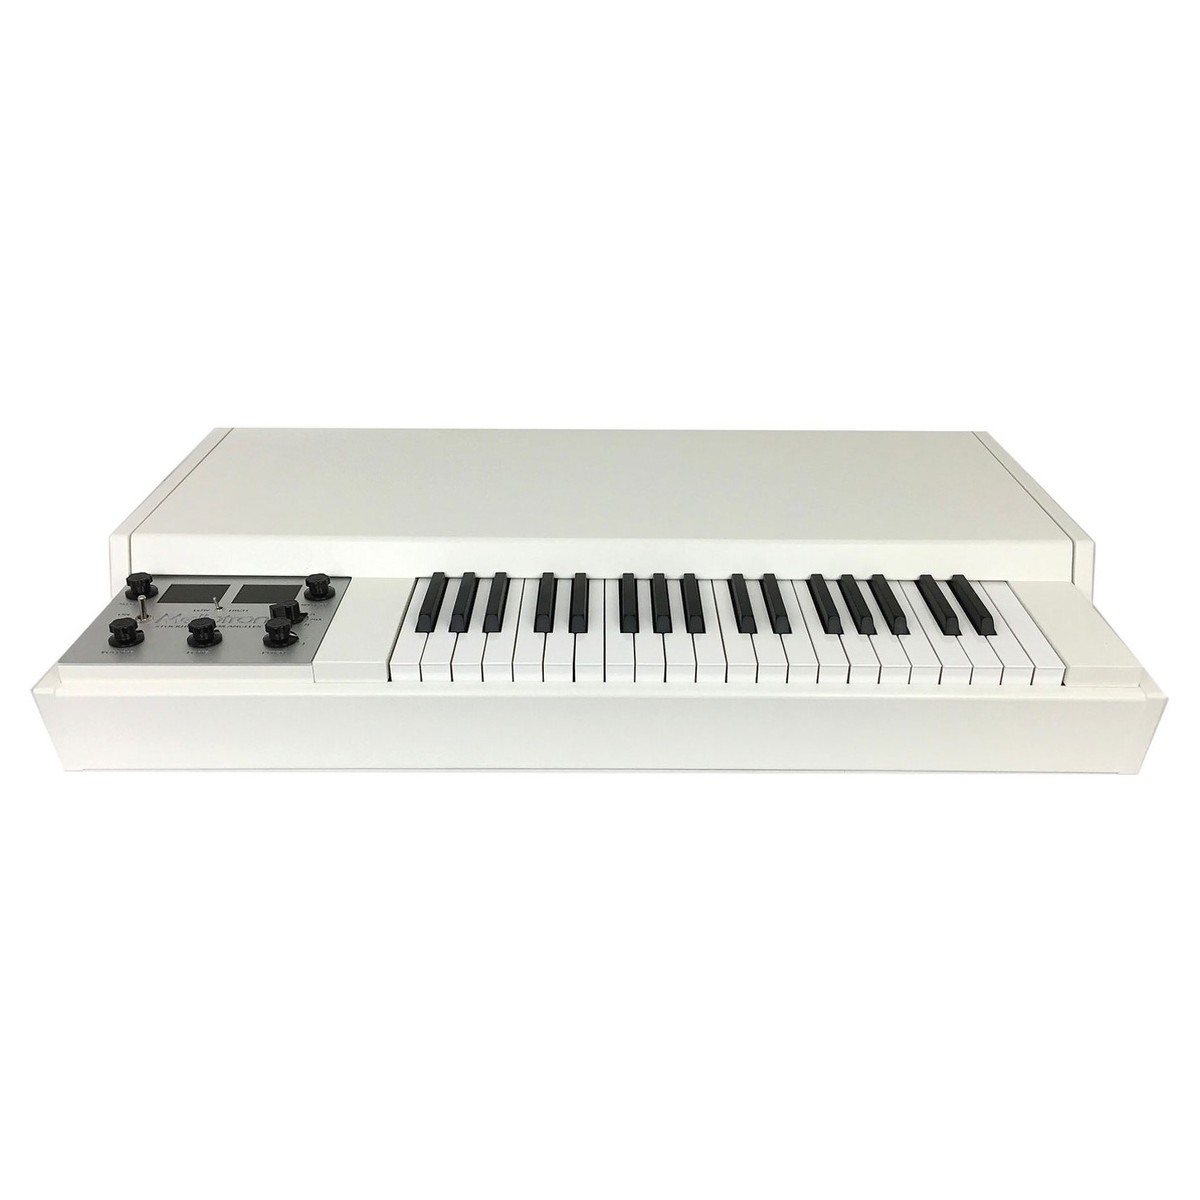 mellotron m4000d white ex demo at gear4music. Black Bedroom Furniture Sets. Home Design Ideas